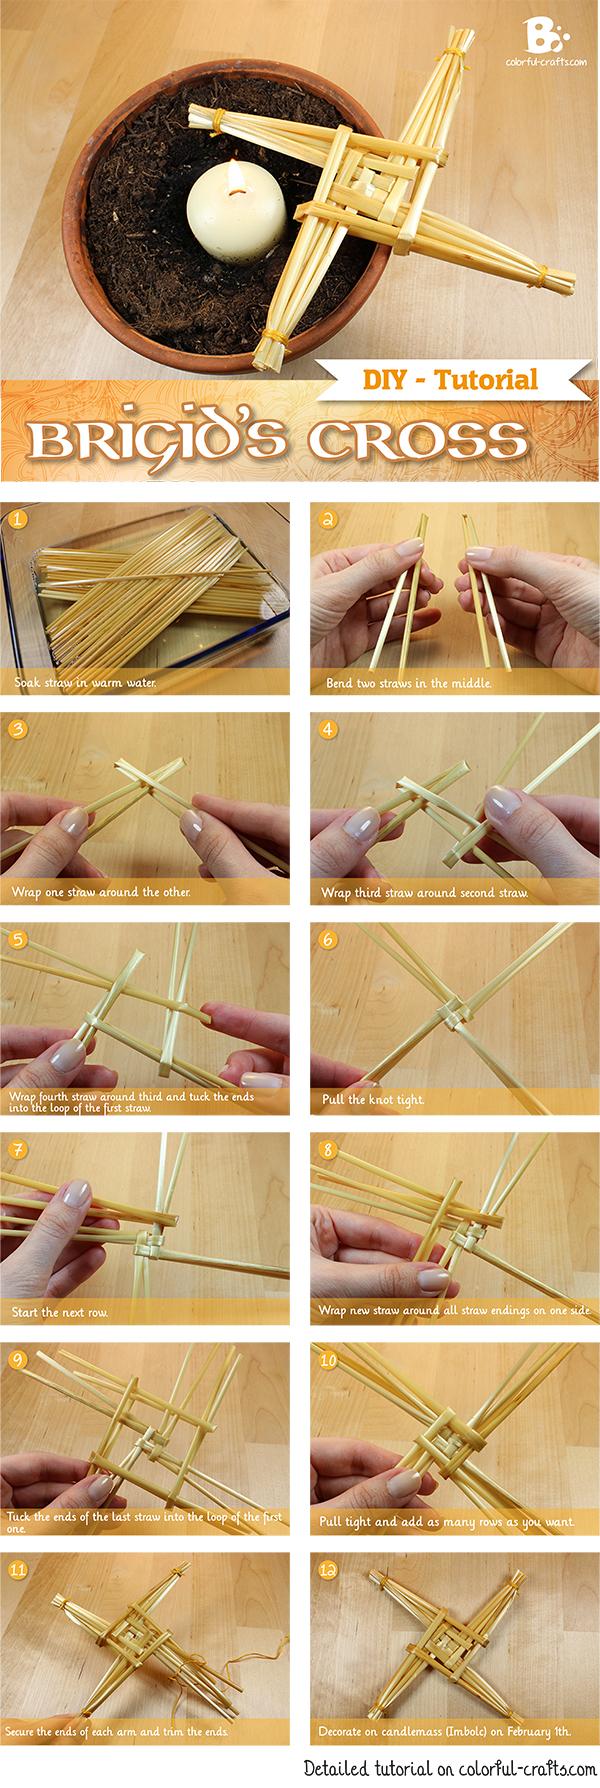 DIY Brigids Cross Tutorial